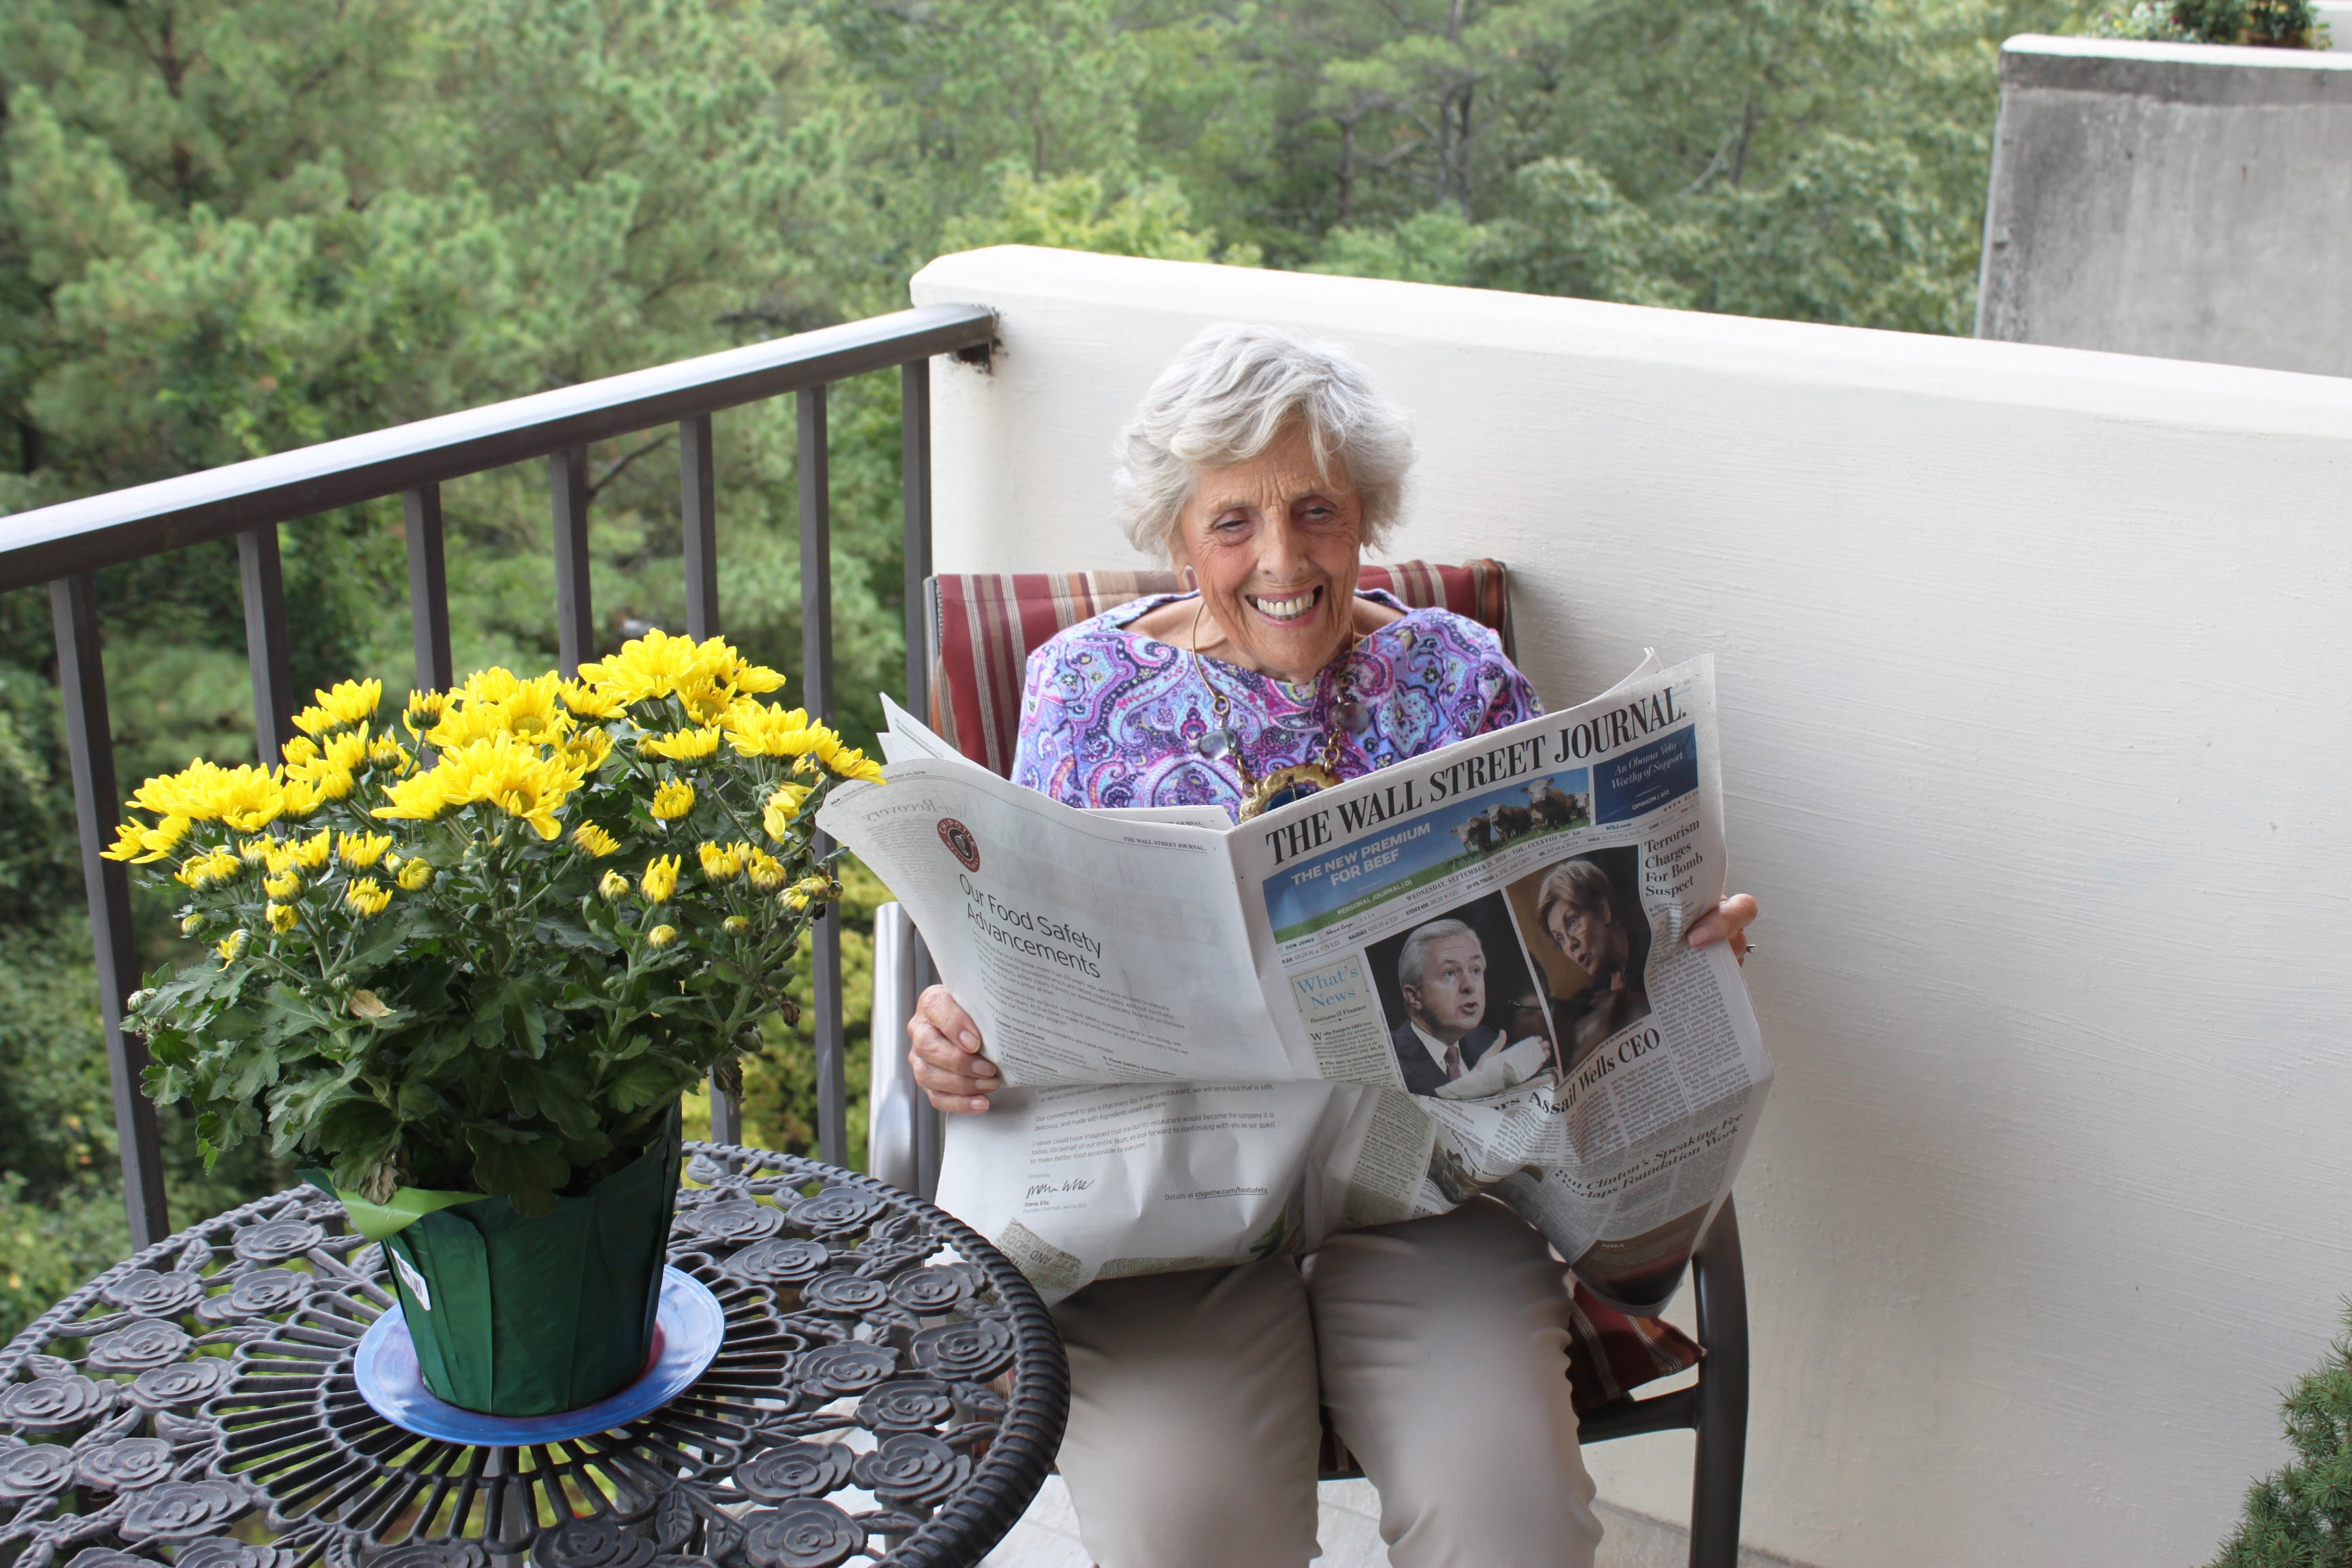 Lady Reading Newspaper on balcony